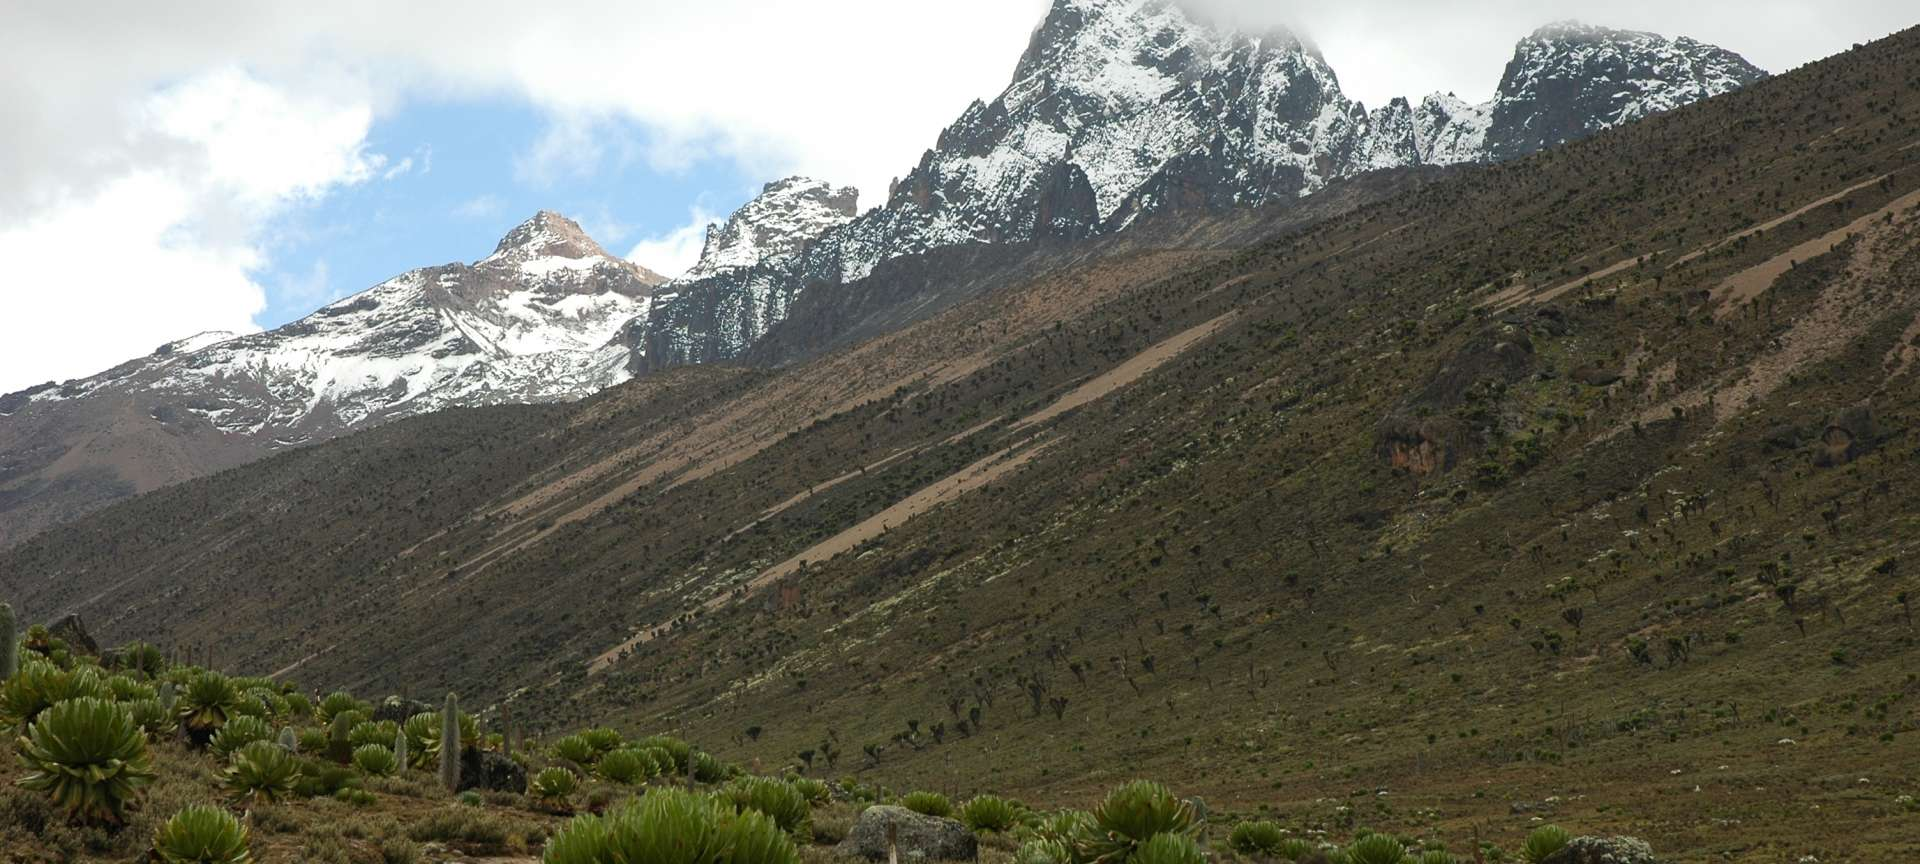 Mount Kenya National Park - Africa Wildlife Safaris